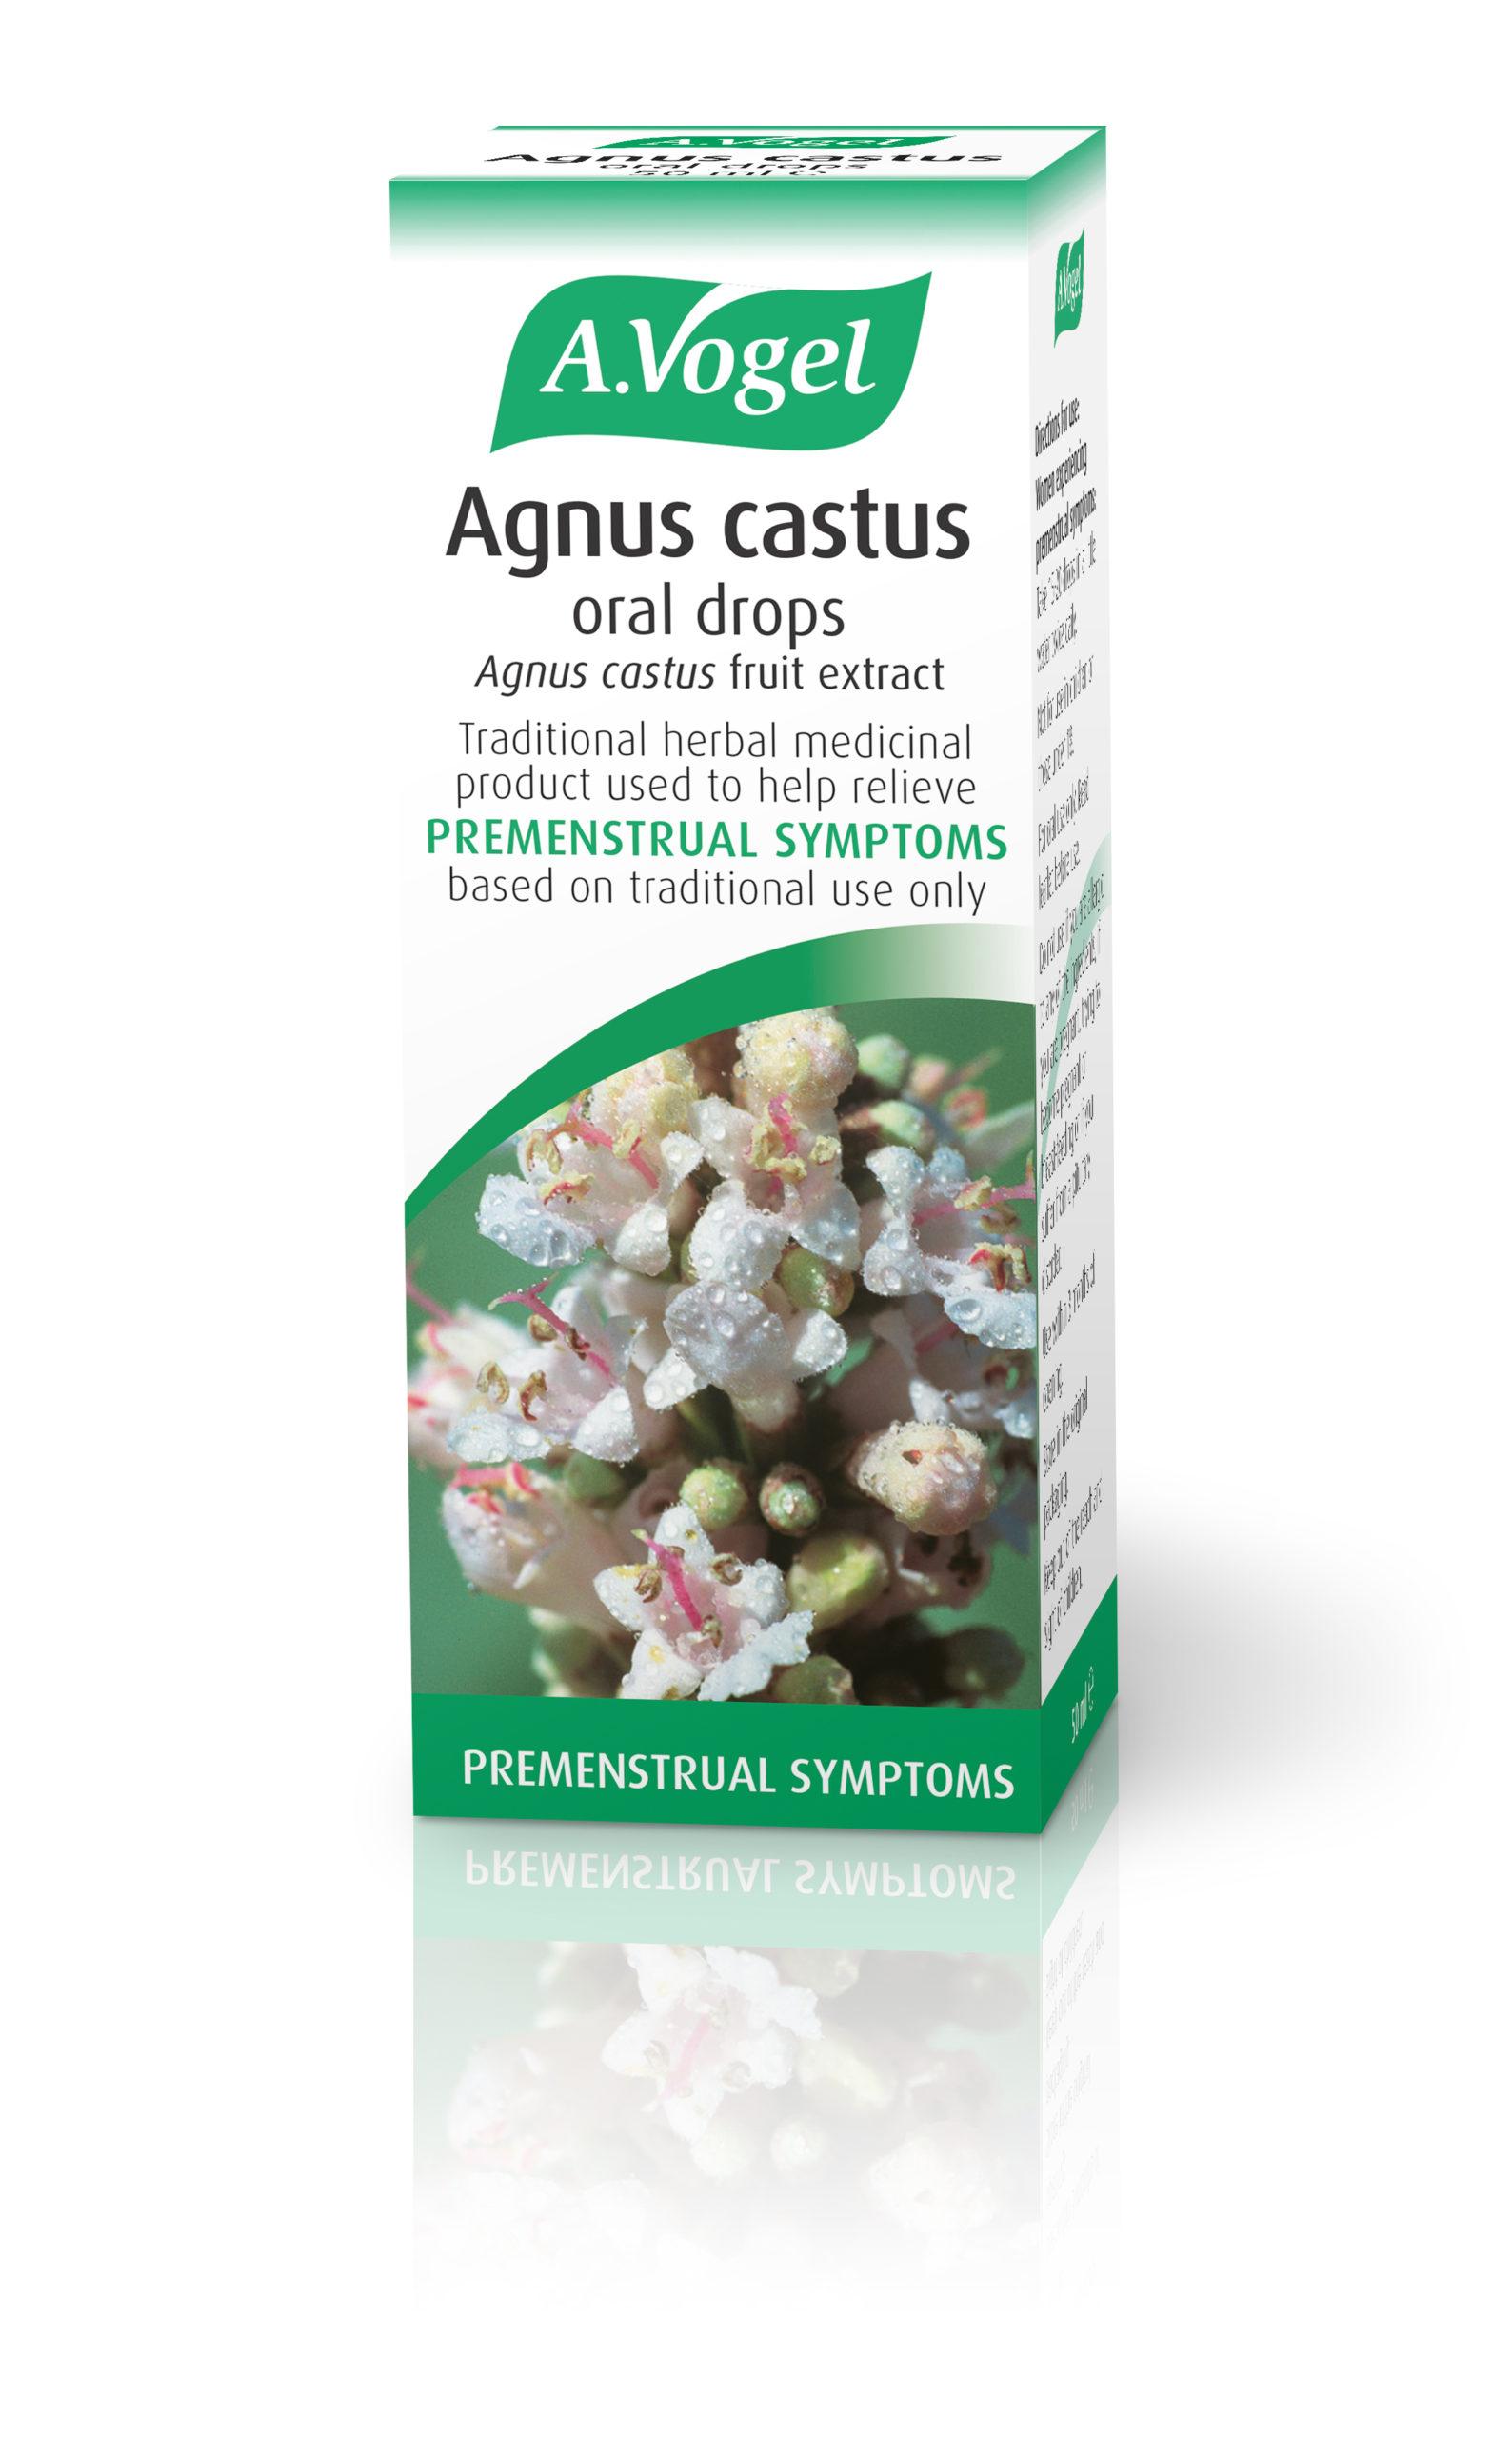 A.Vogel Agnus castus oral drops